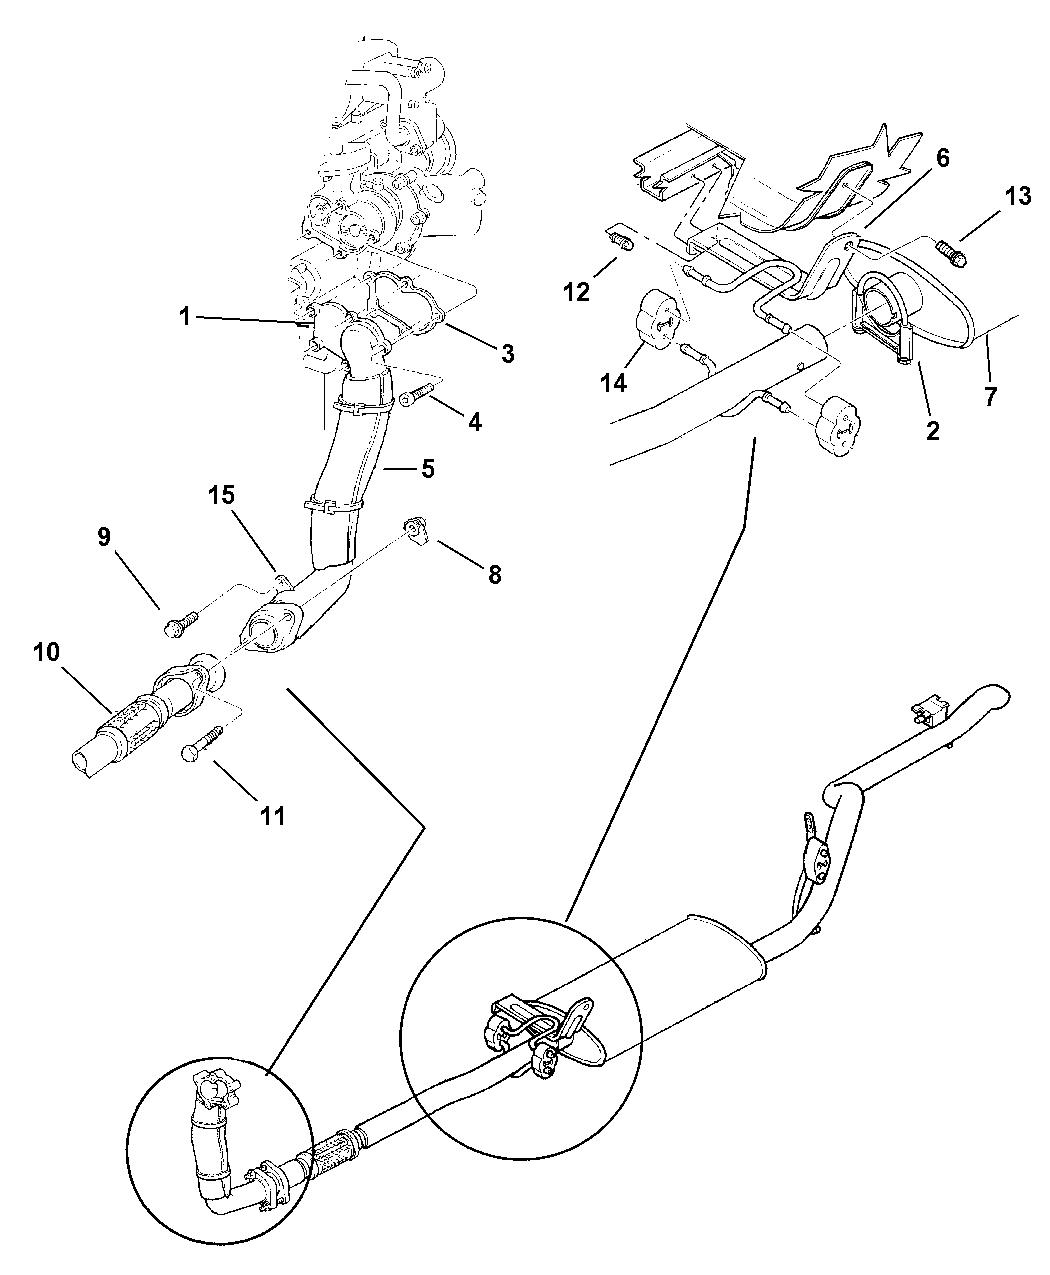 1997 jeep cherokee transmission diagram 1997 jeep cherokee exhaust diagram